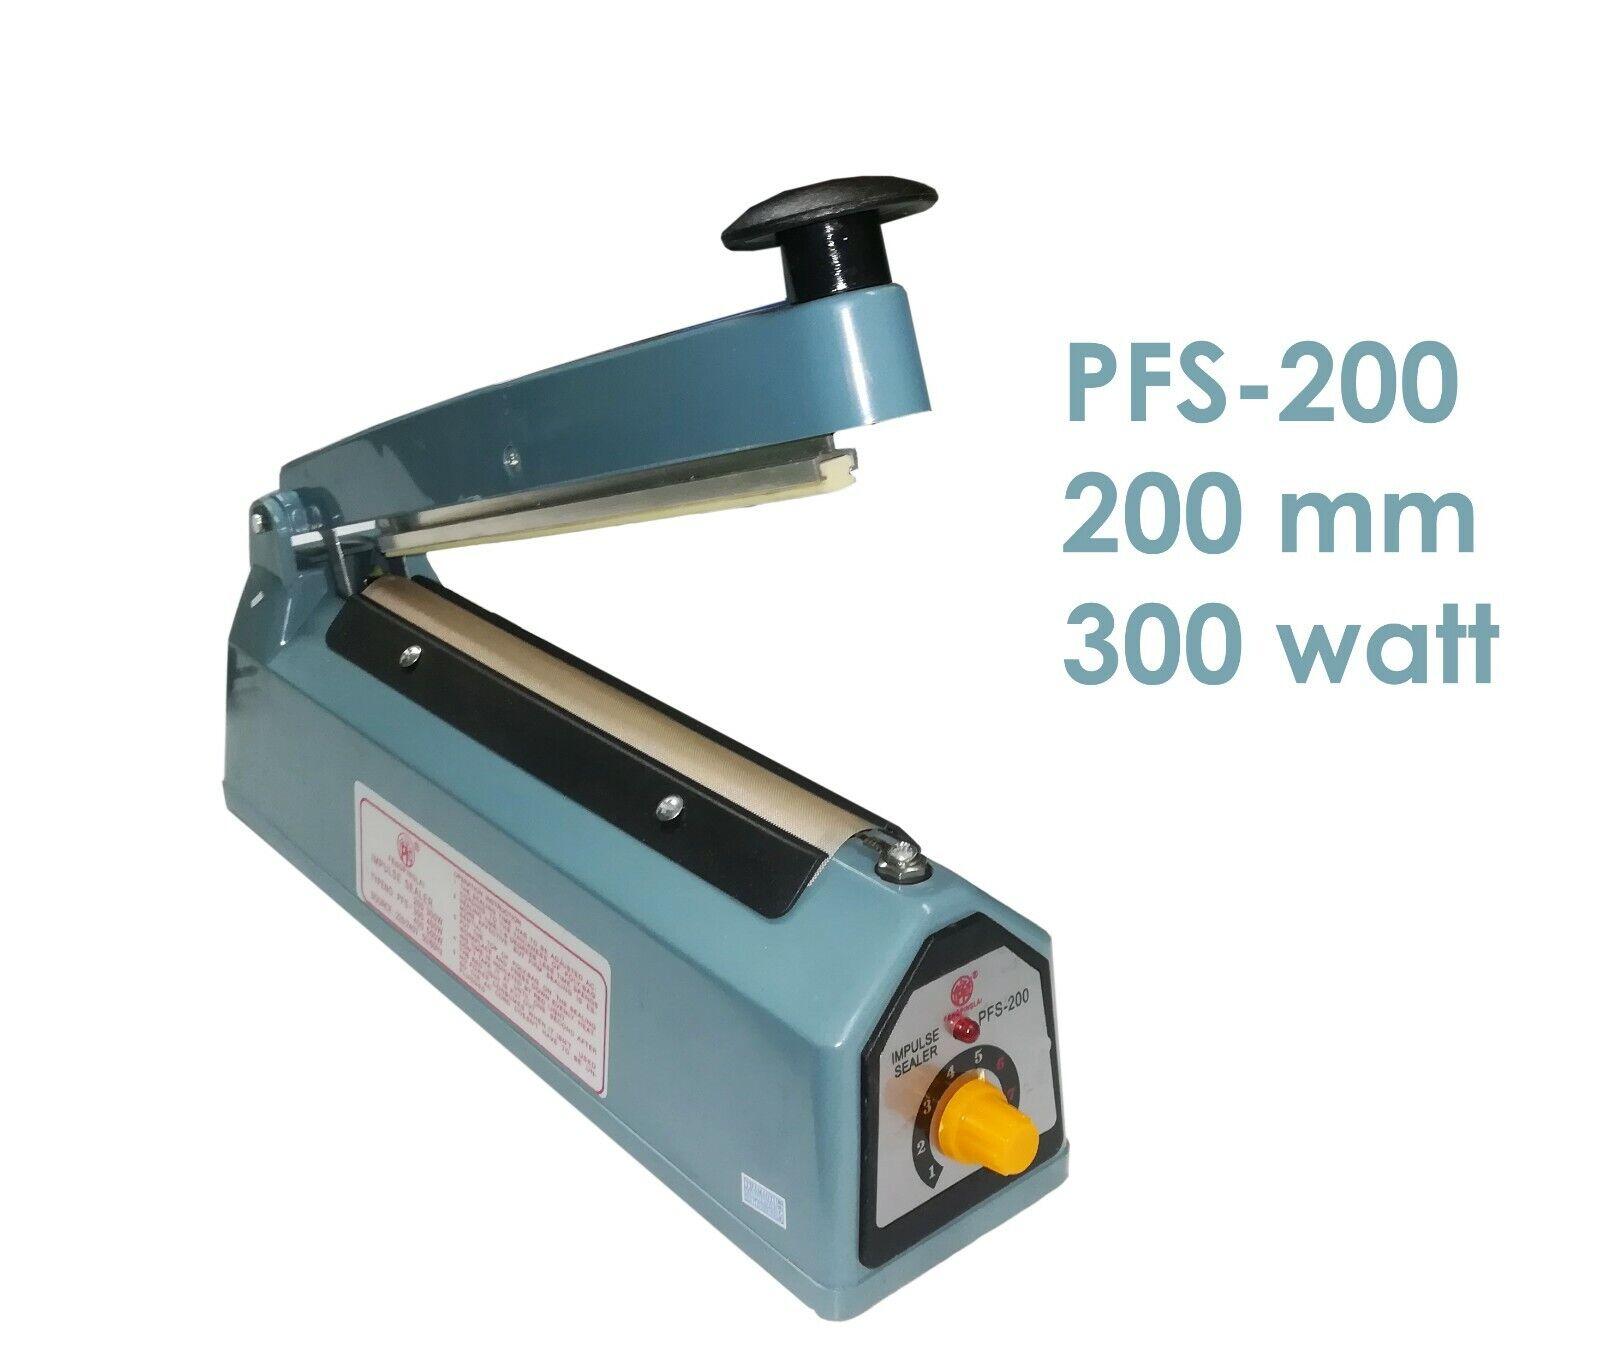 MACCHINA SIGILLA BUSTE SACCHETTI SIGILLATRICE PLASTICA A CALDO PFS-200